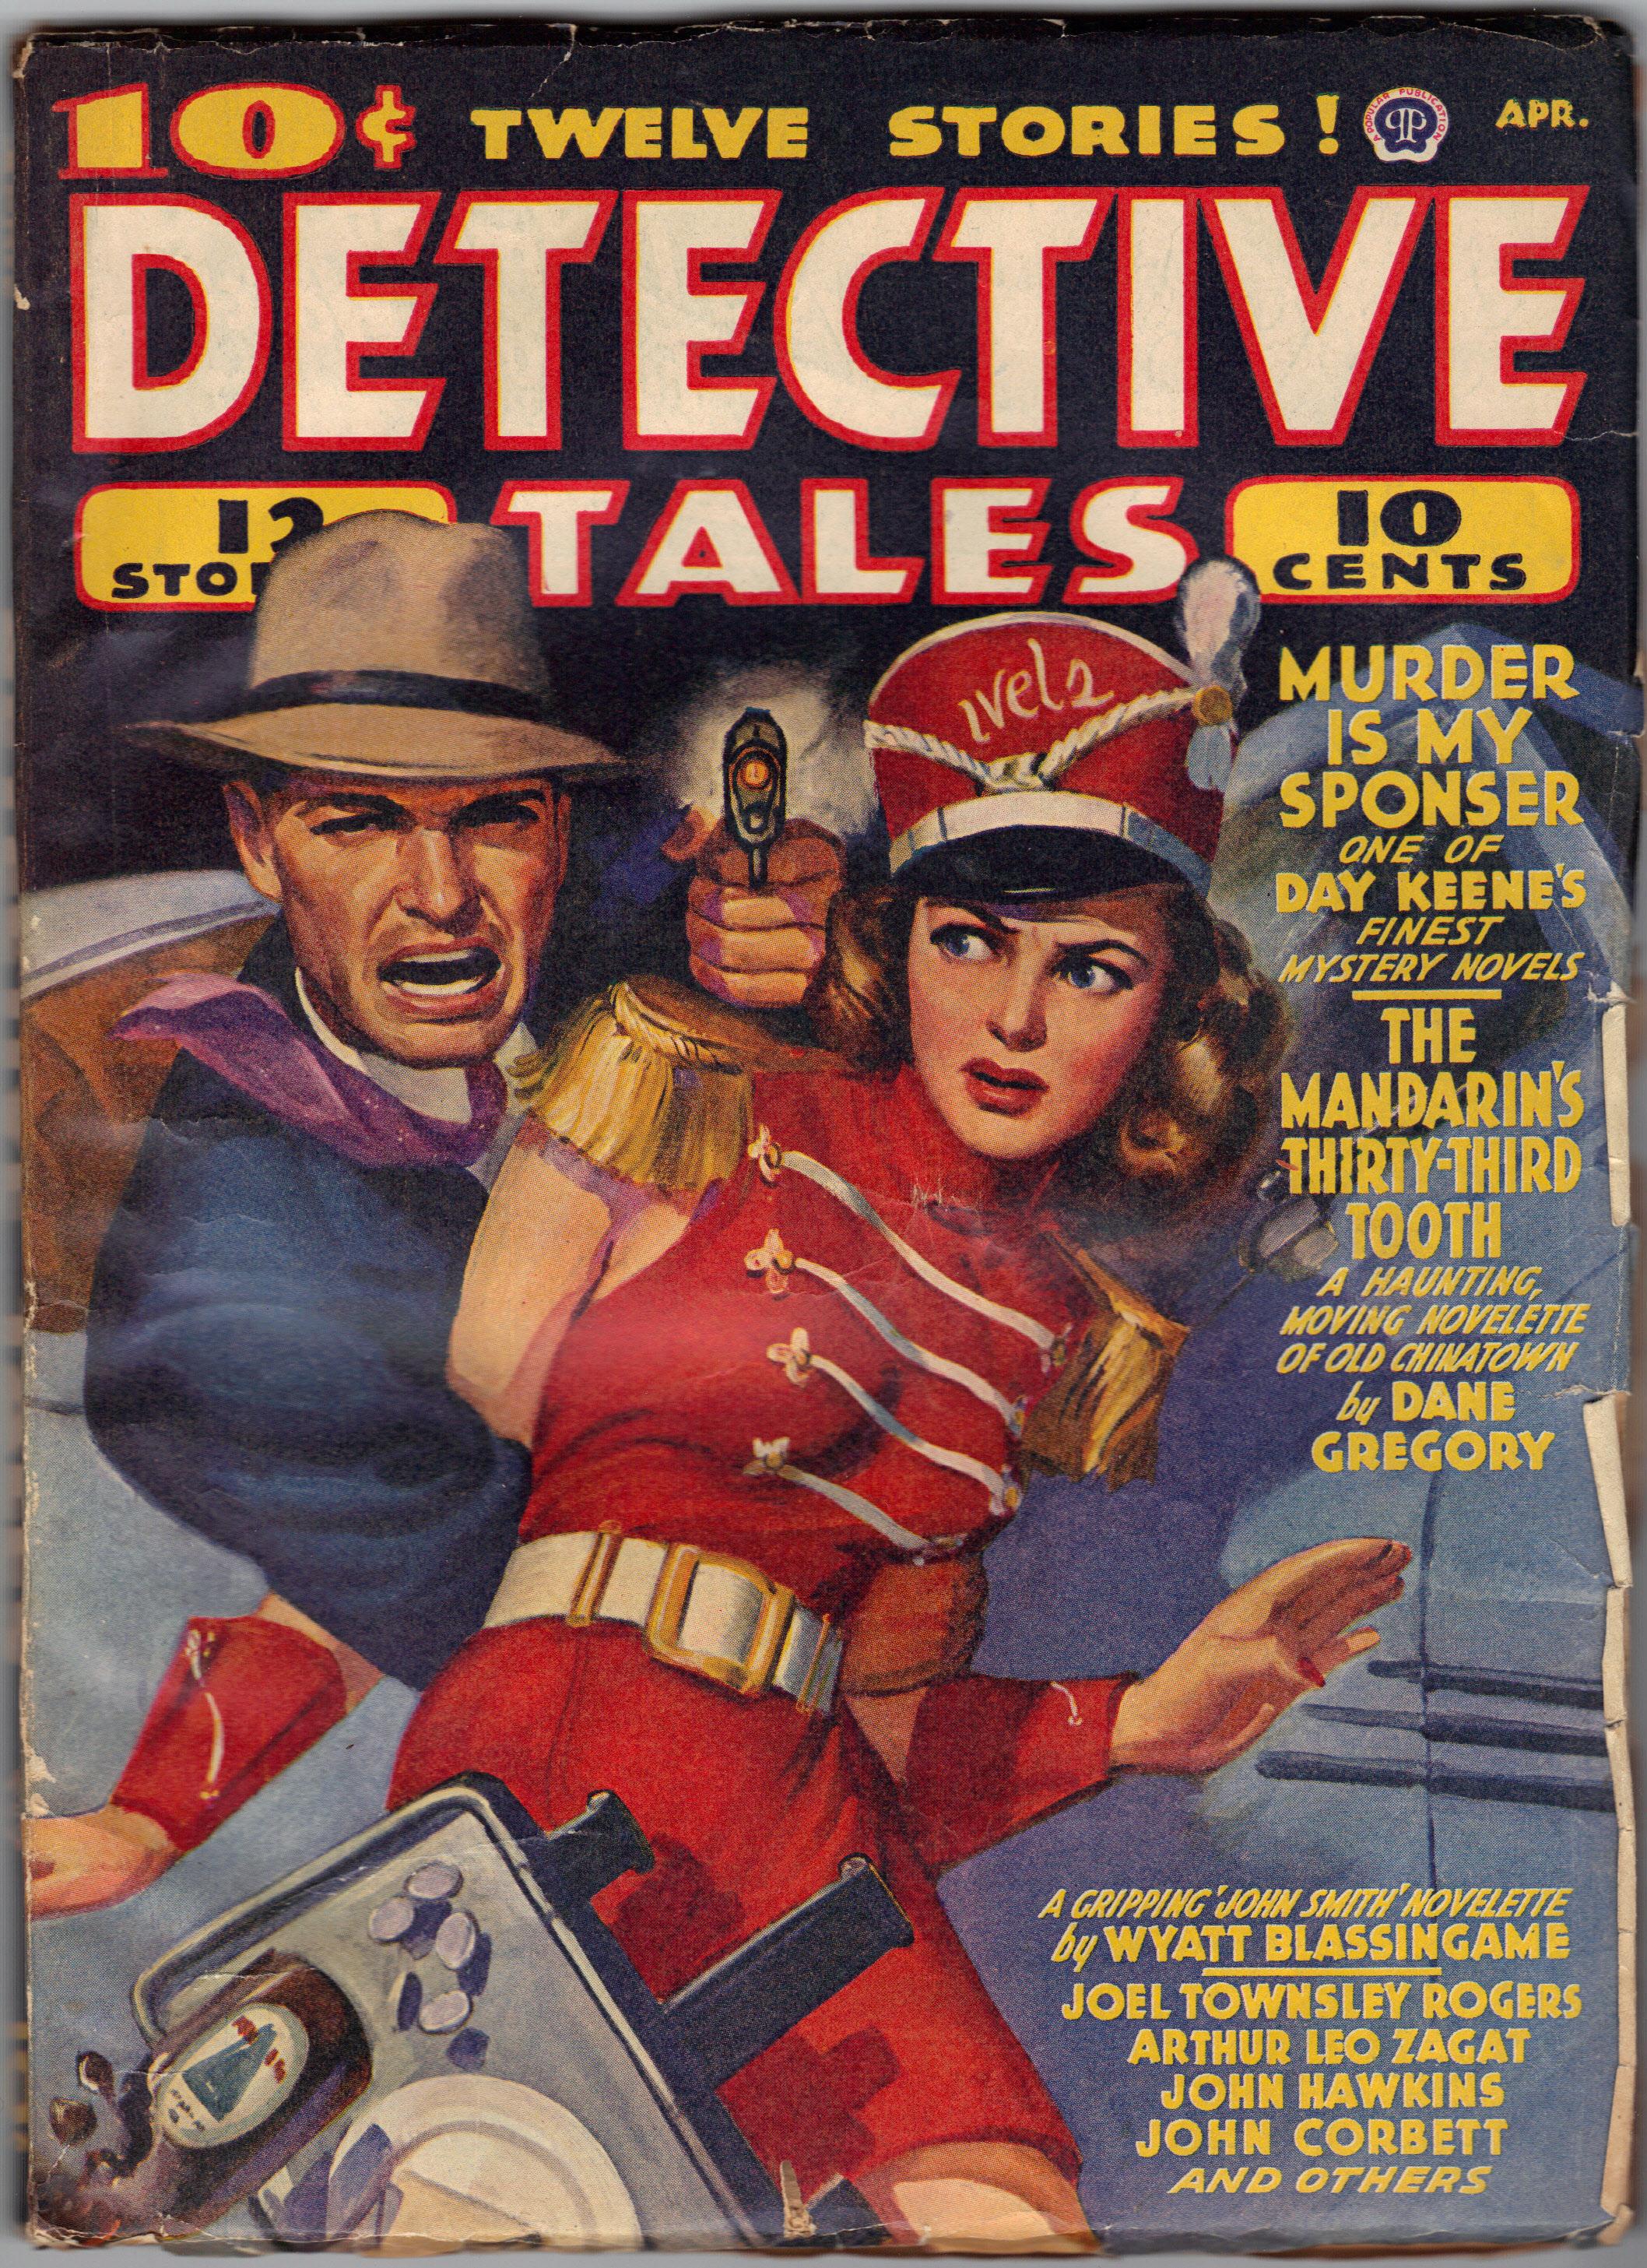 DETECTIVE TALES